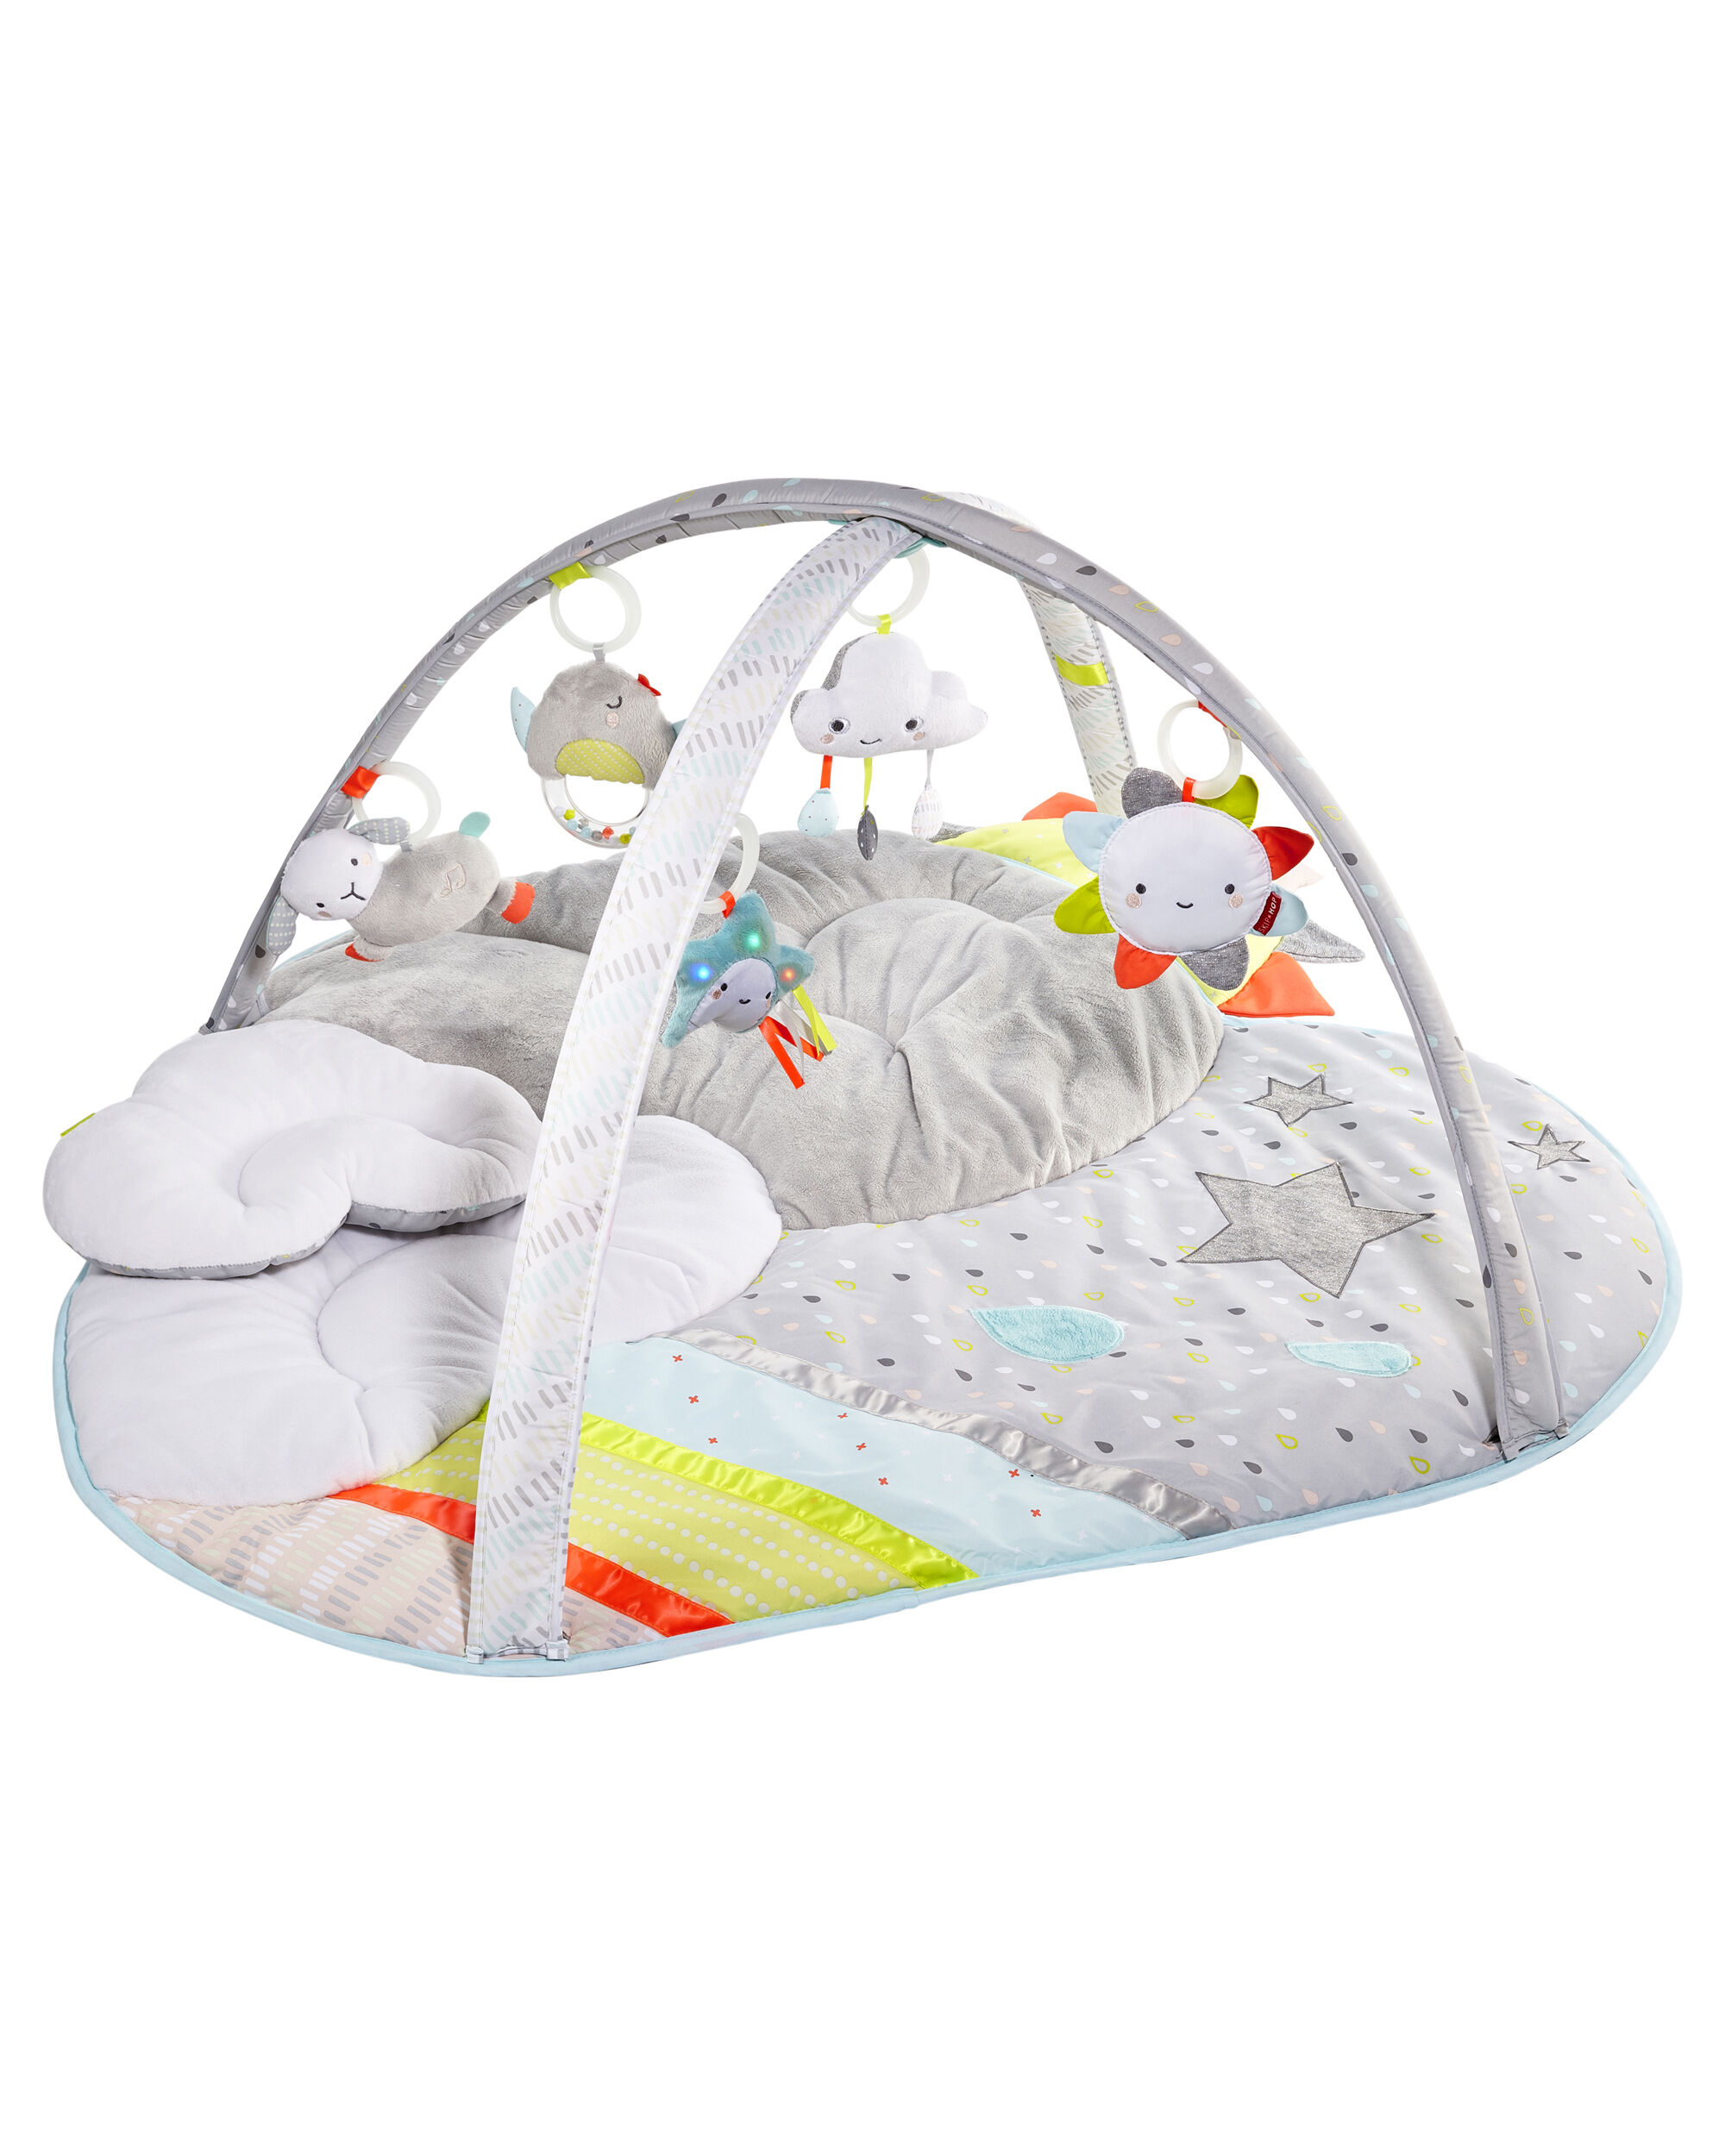 Baby play mats activity gyms skip hop free shipping